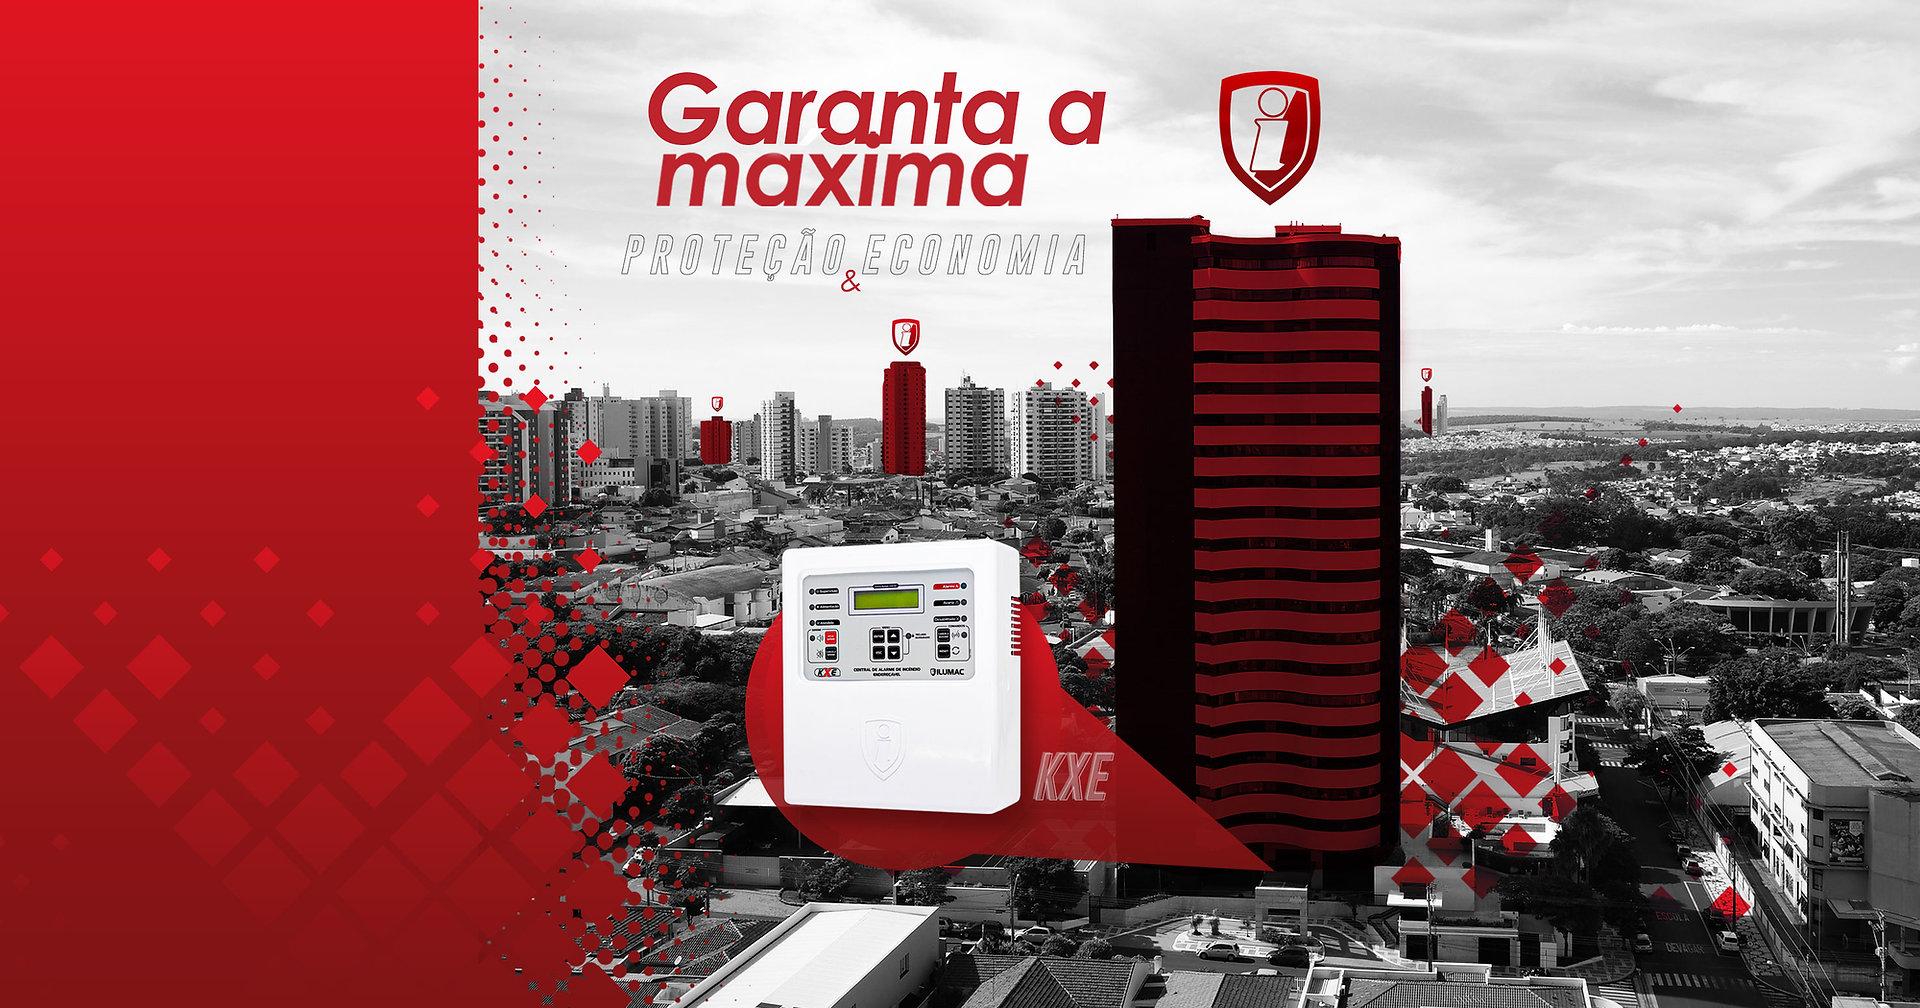 banner-KXE-2020-BUILDING-ILUMAC-PROTECTI